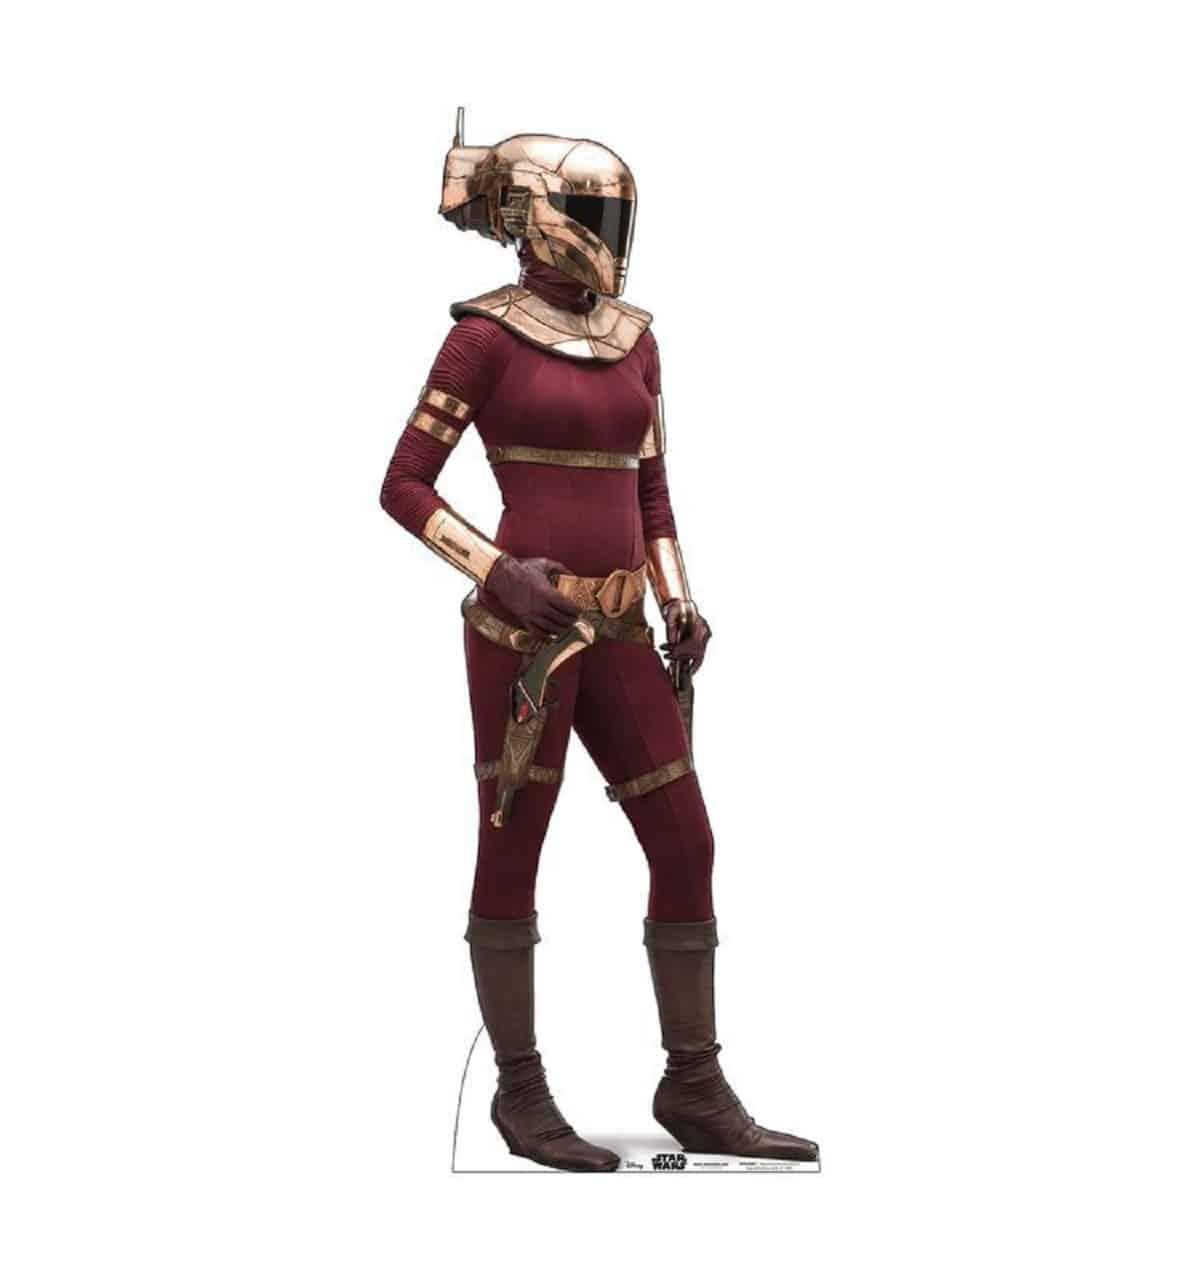 The bounty hunter Zorri Bliss